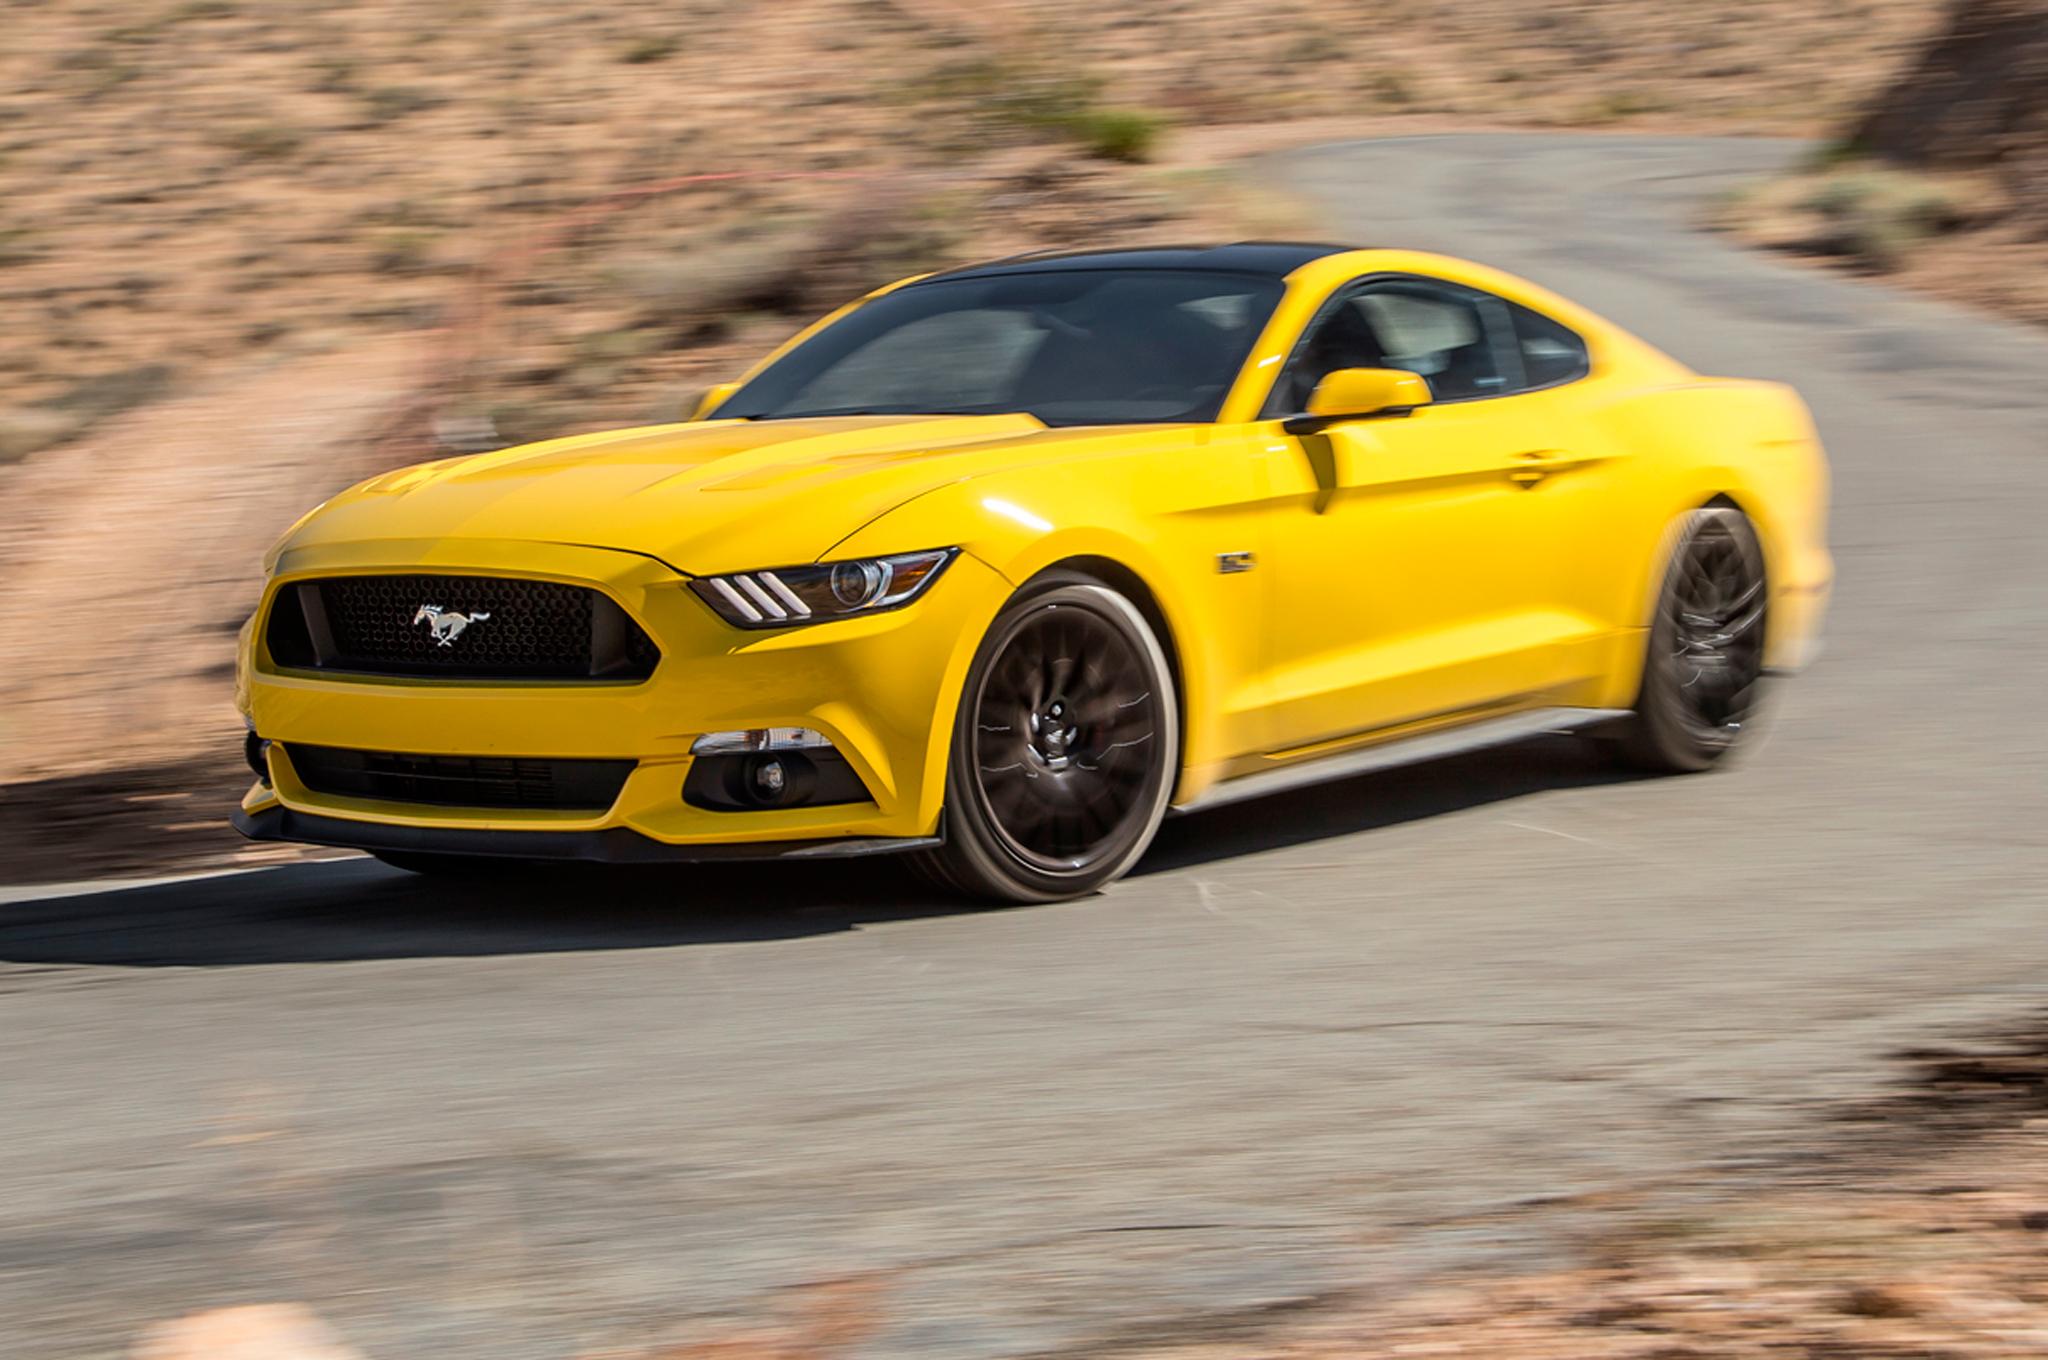 Brushed Aluminum Wheels 2014 Mustang Car Wallpaper Fuse Box